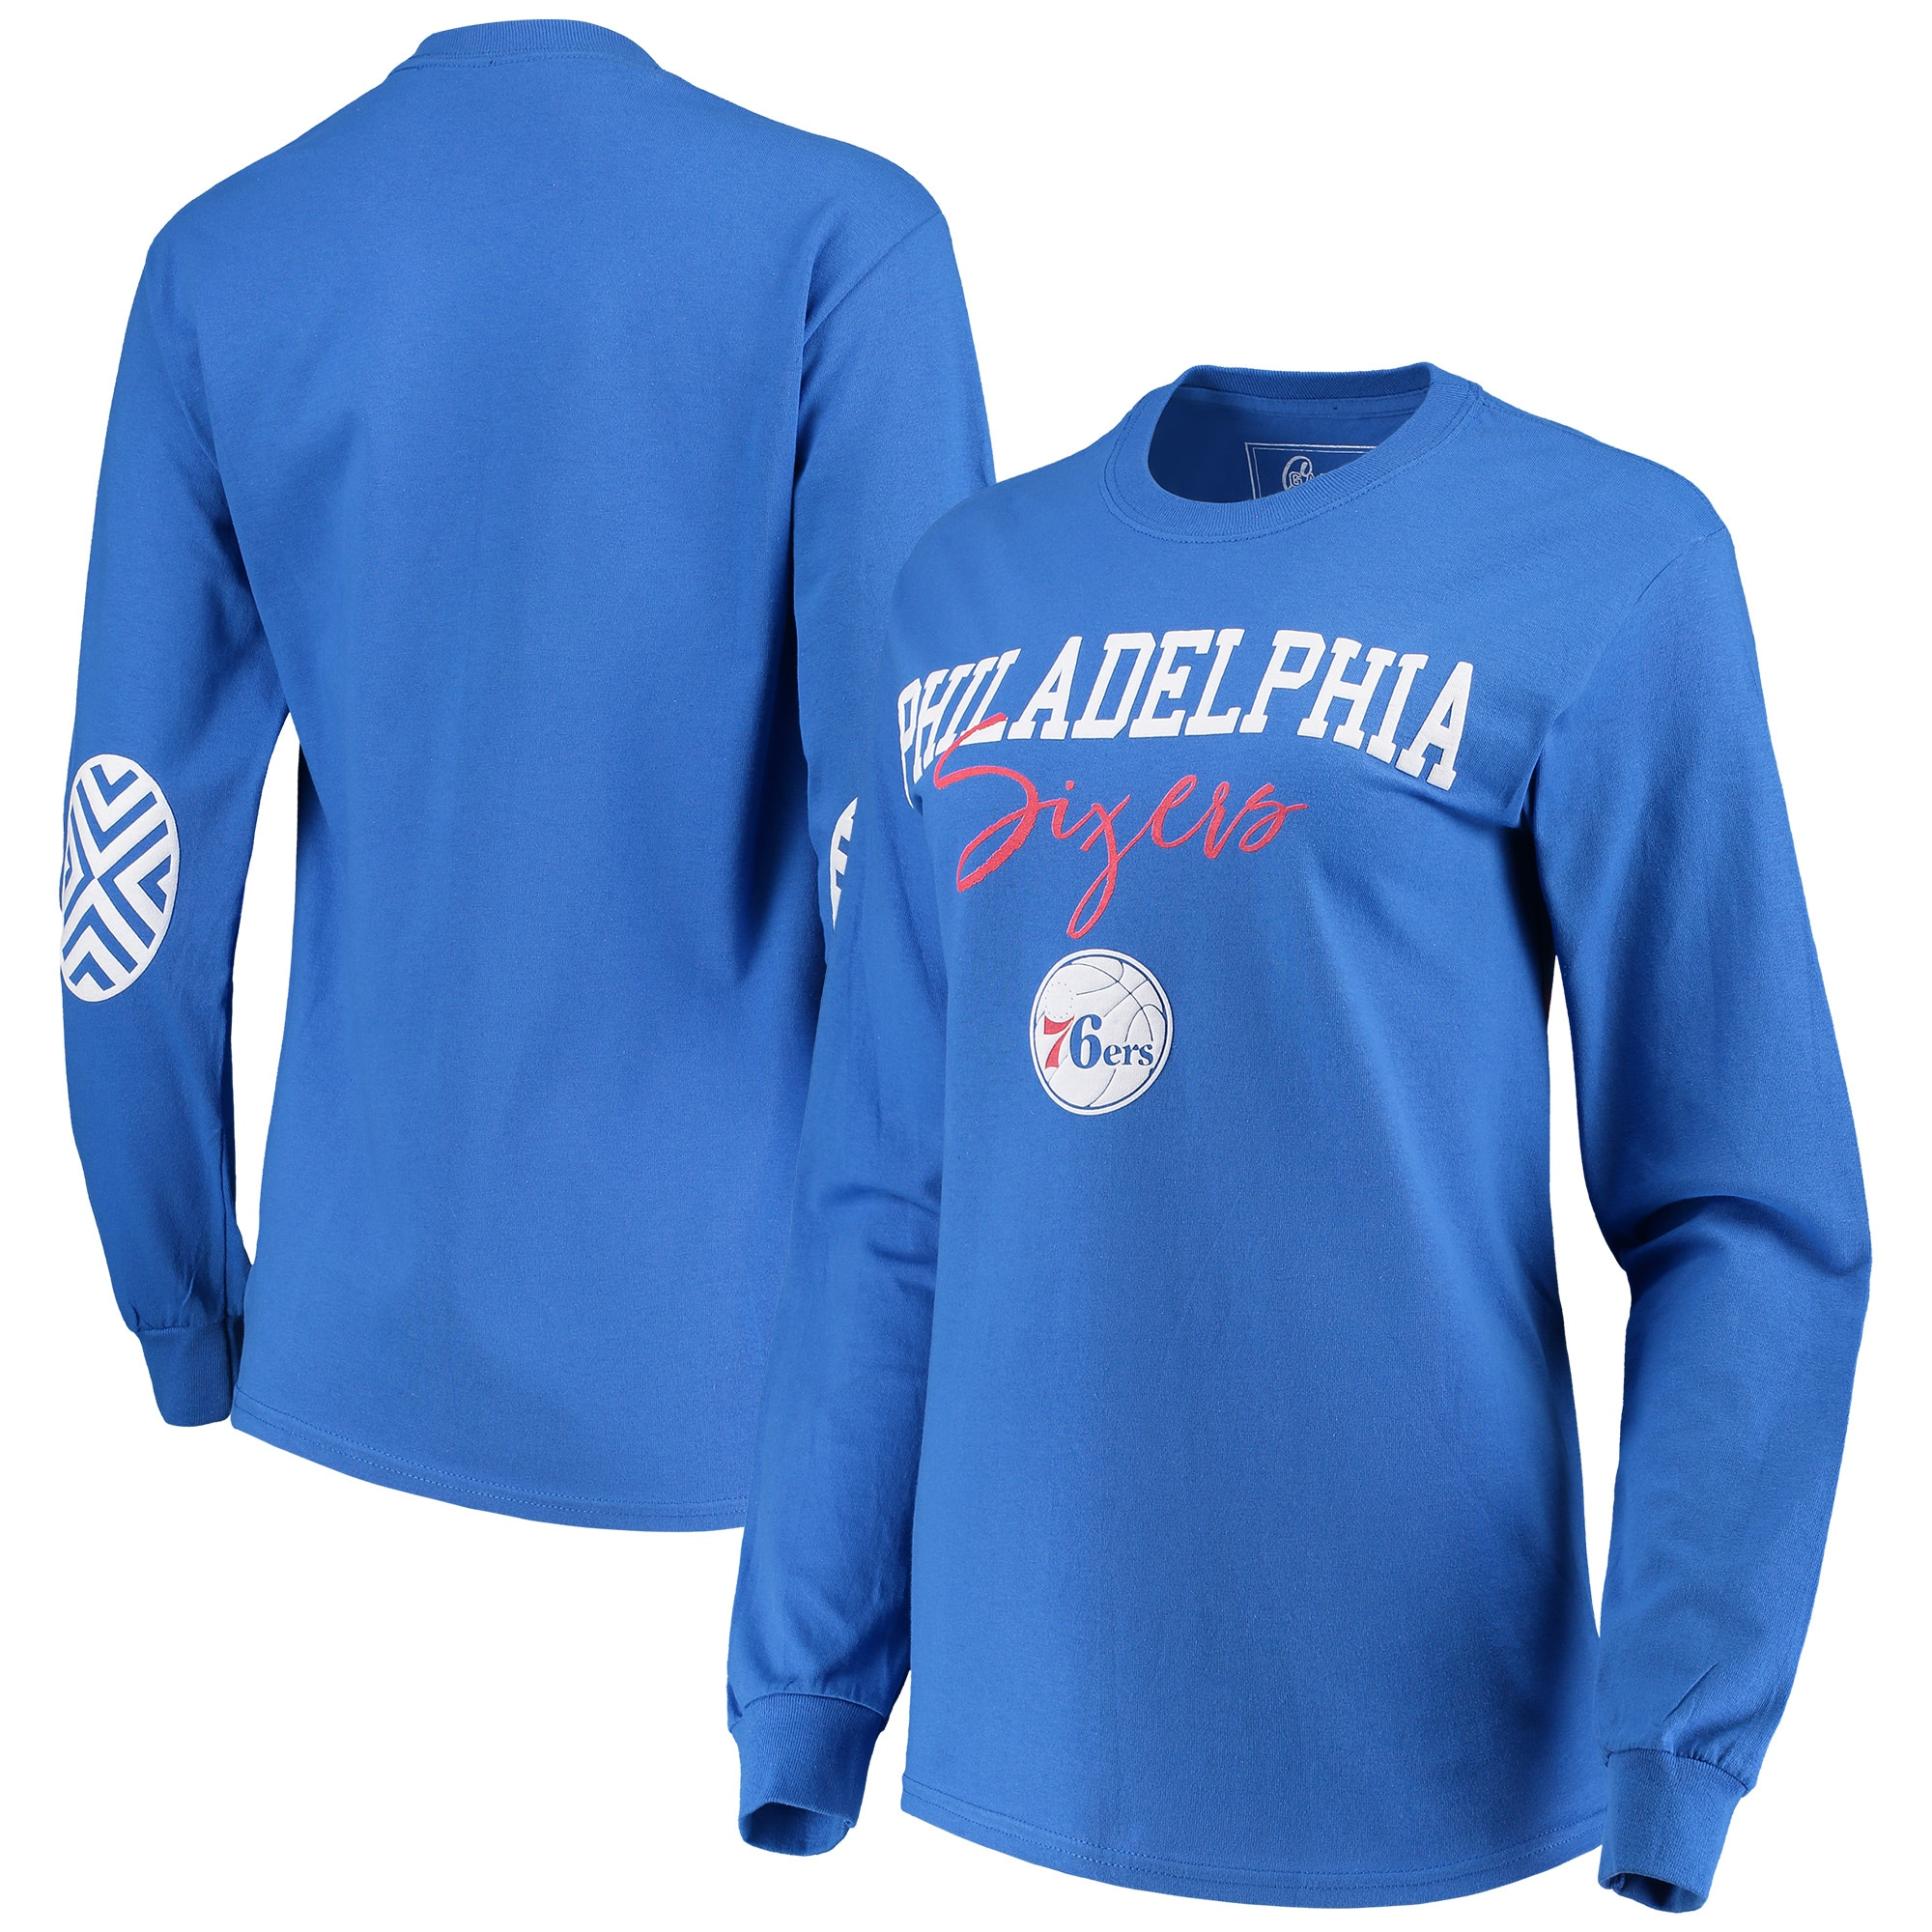 Philadelphia 76ers Women's Elbow Patch Long Sleeve T-Shirt - Royal